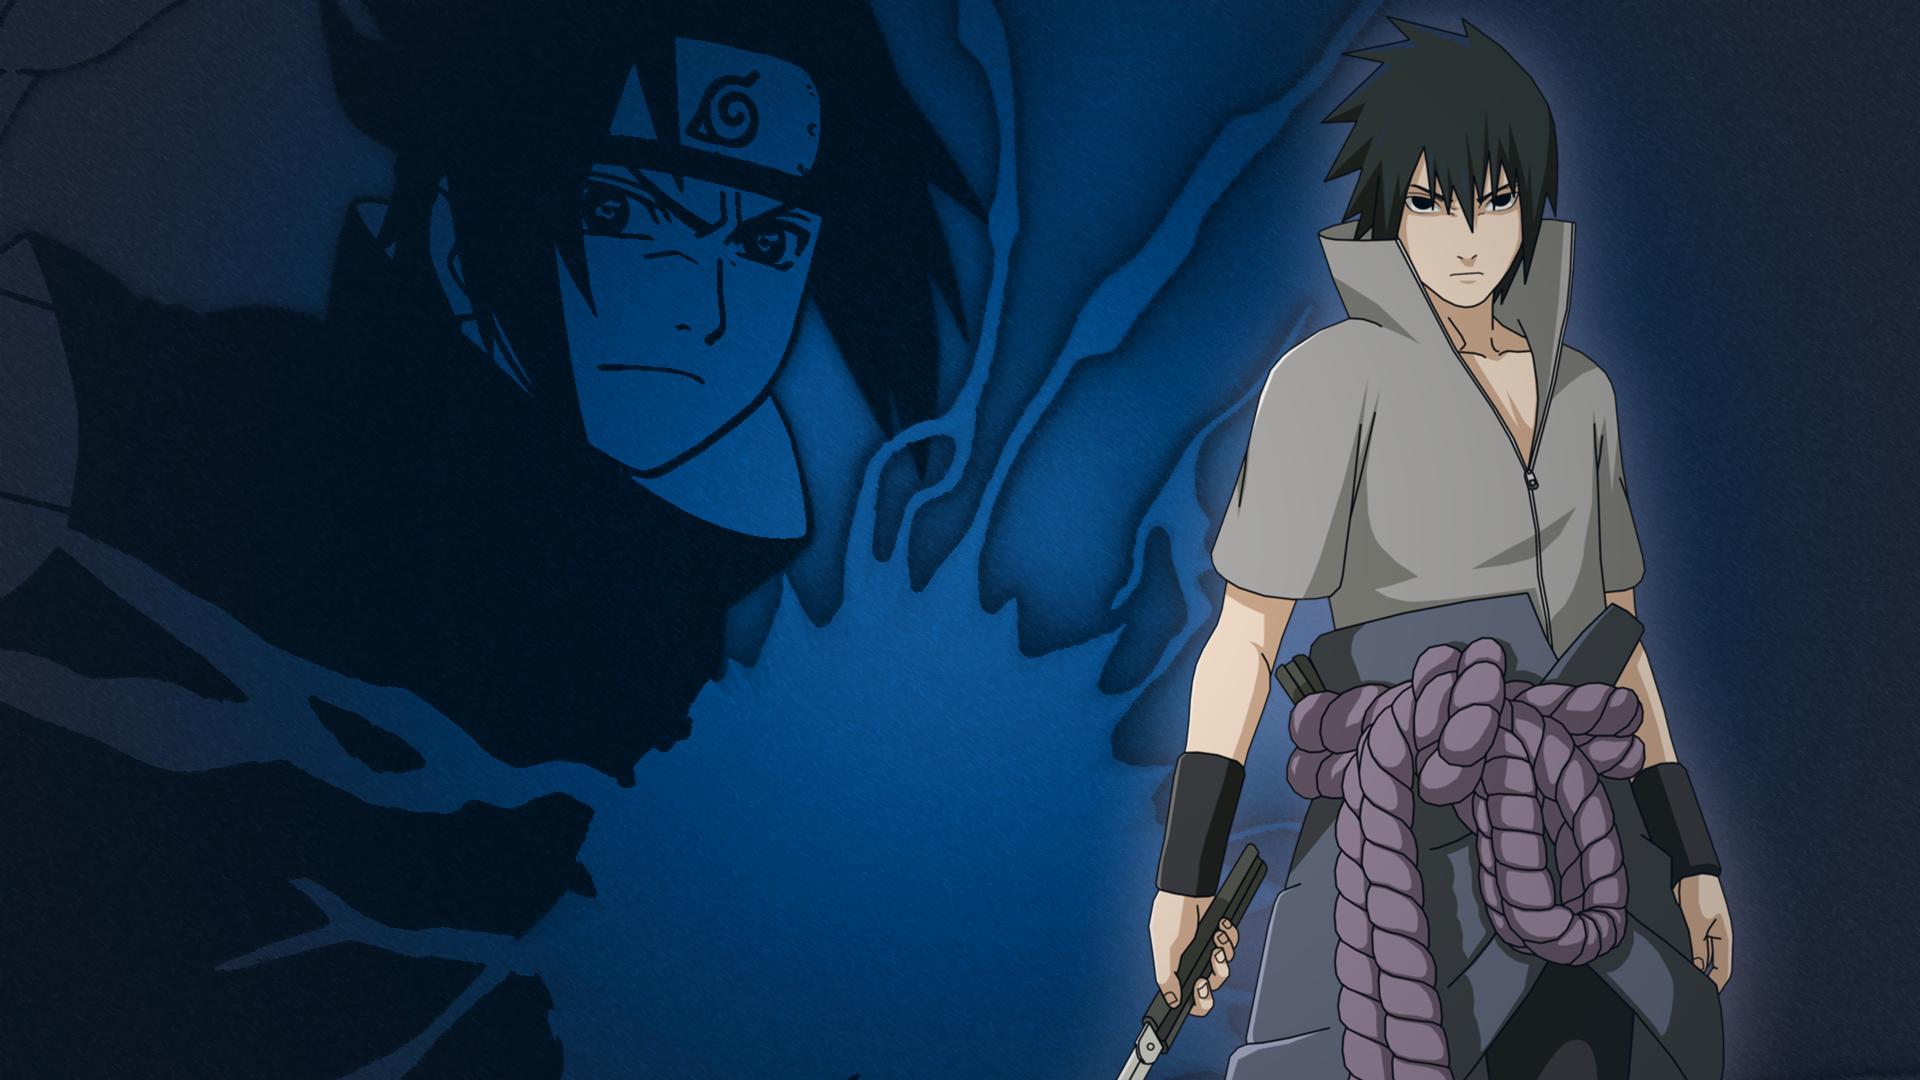 sasuke uchiha naruto anime a2lsZmuUmZqaraWkpJRmbmdlrWZlbWU